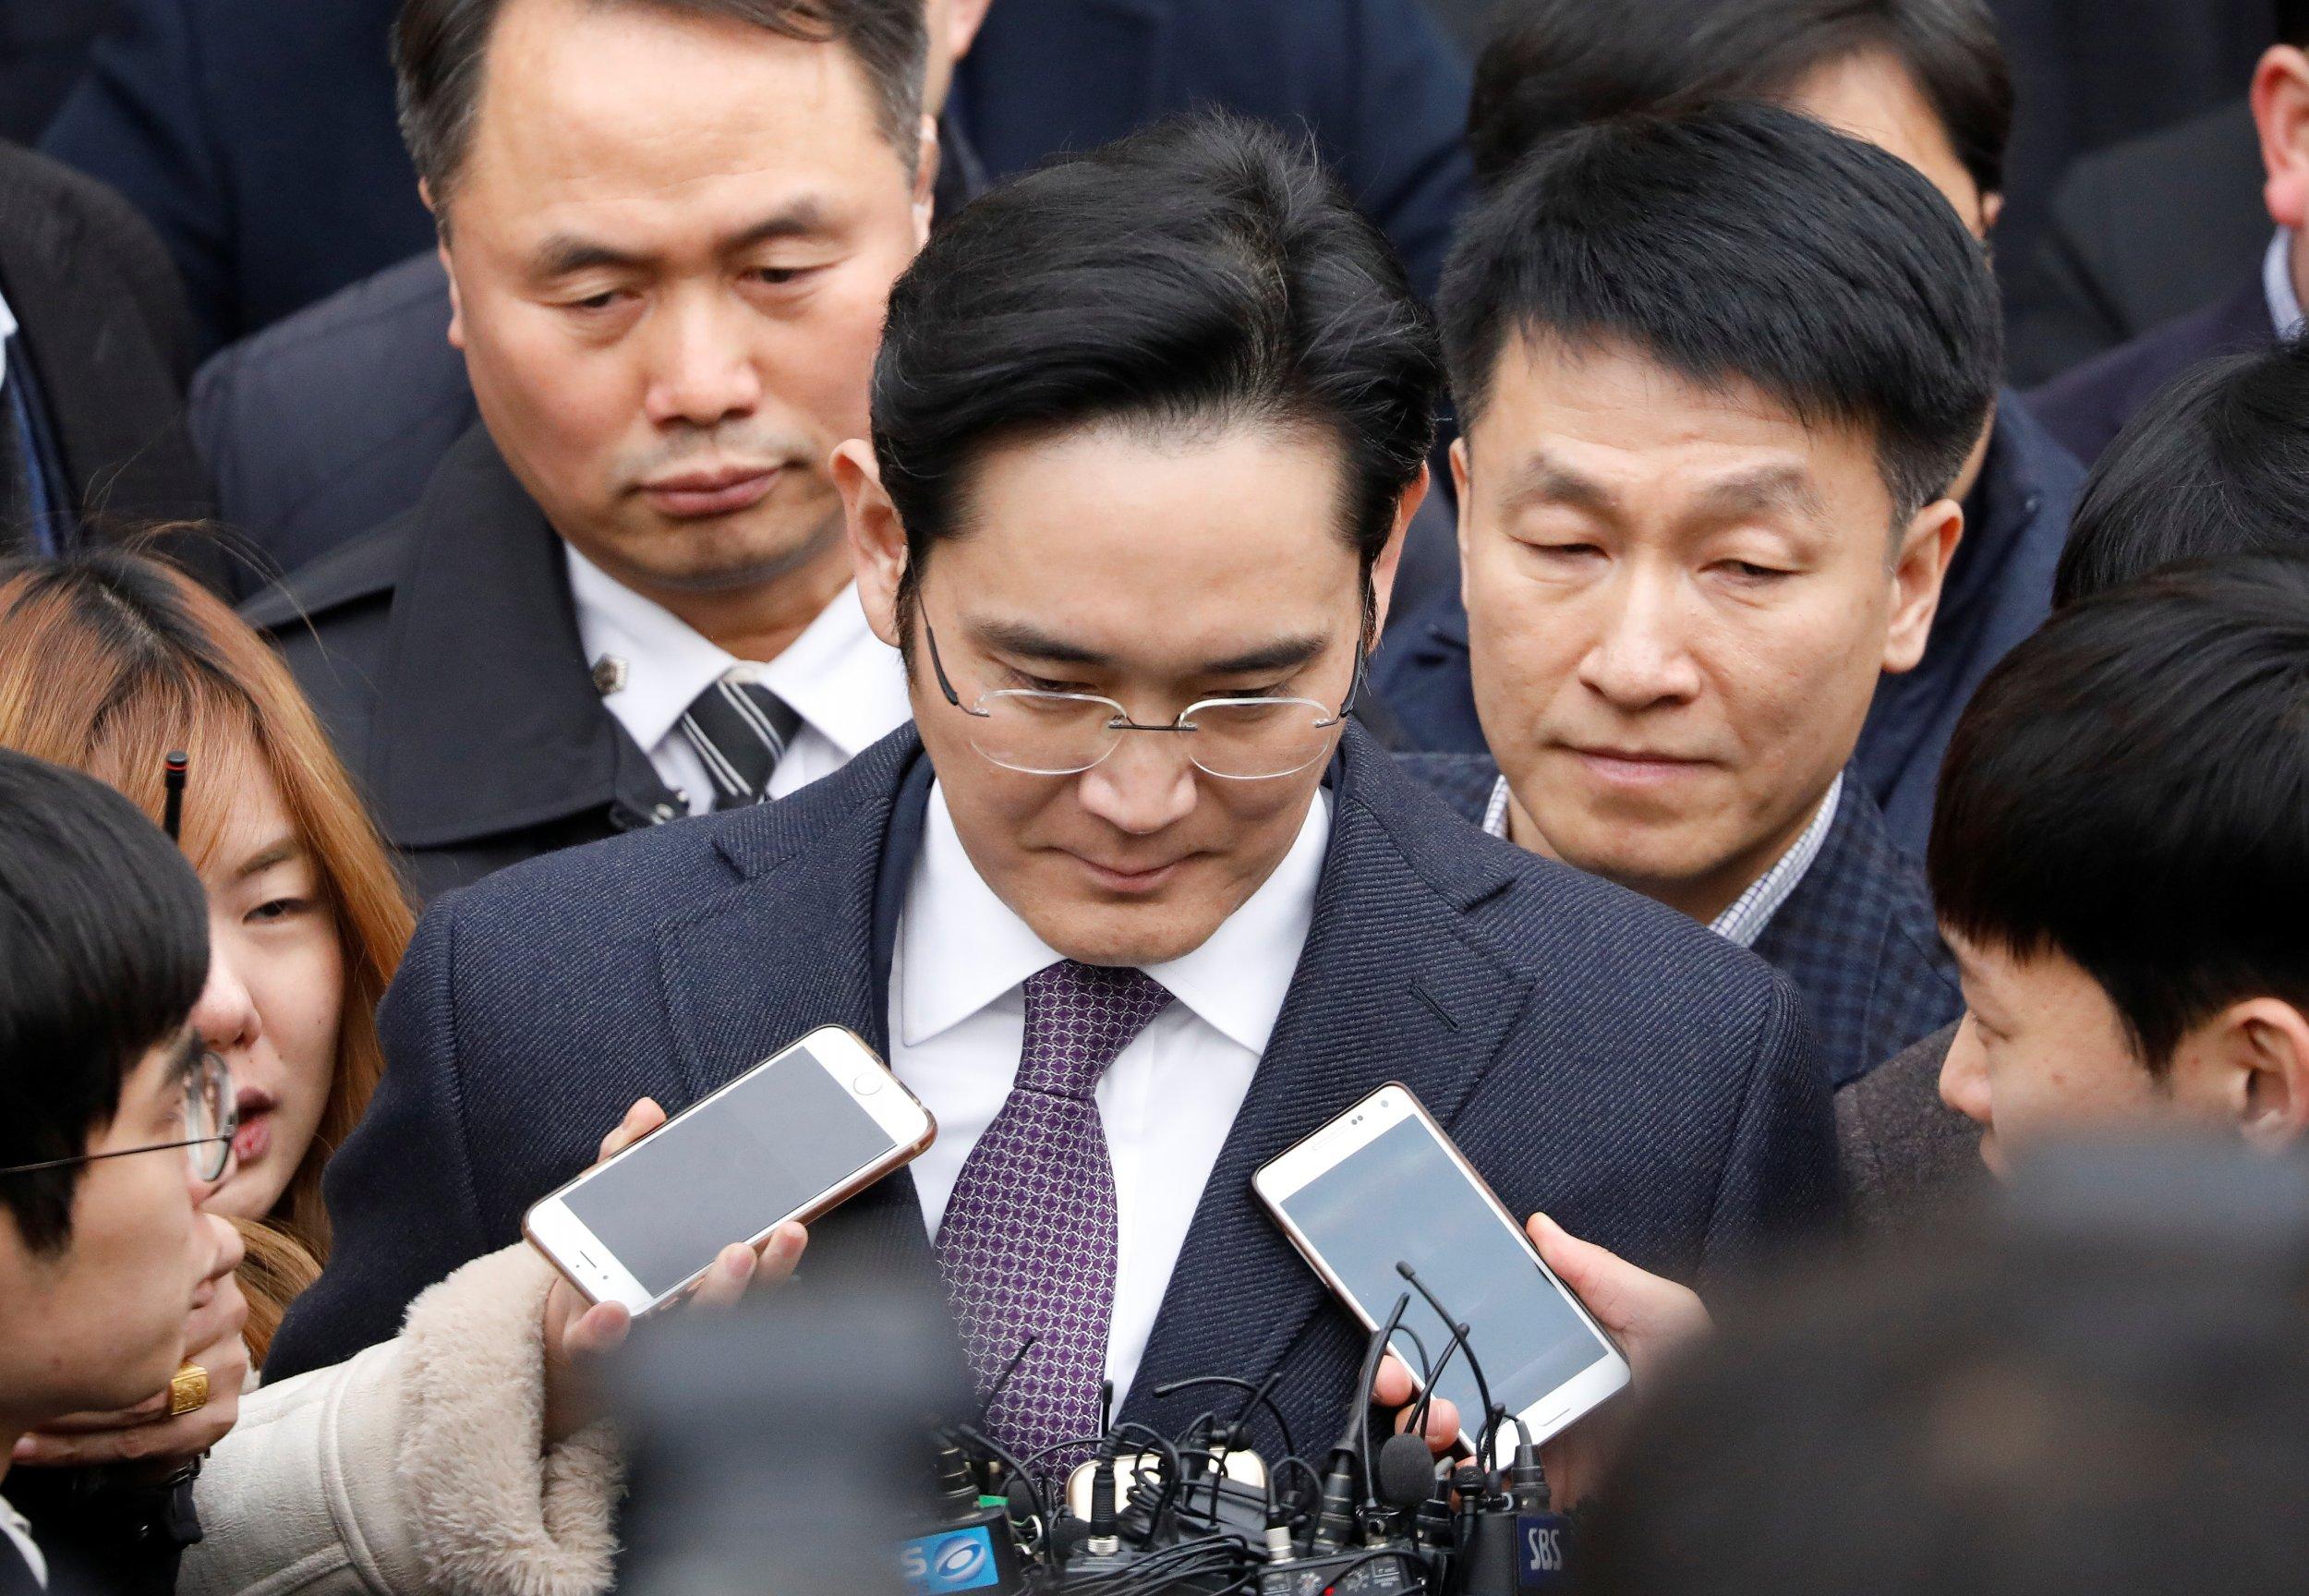 Samsung Group chief executive Jay Y. Lee